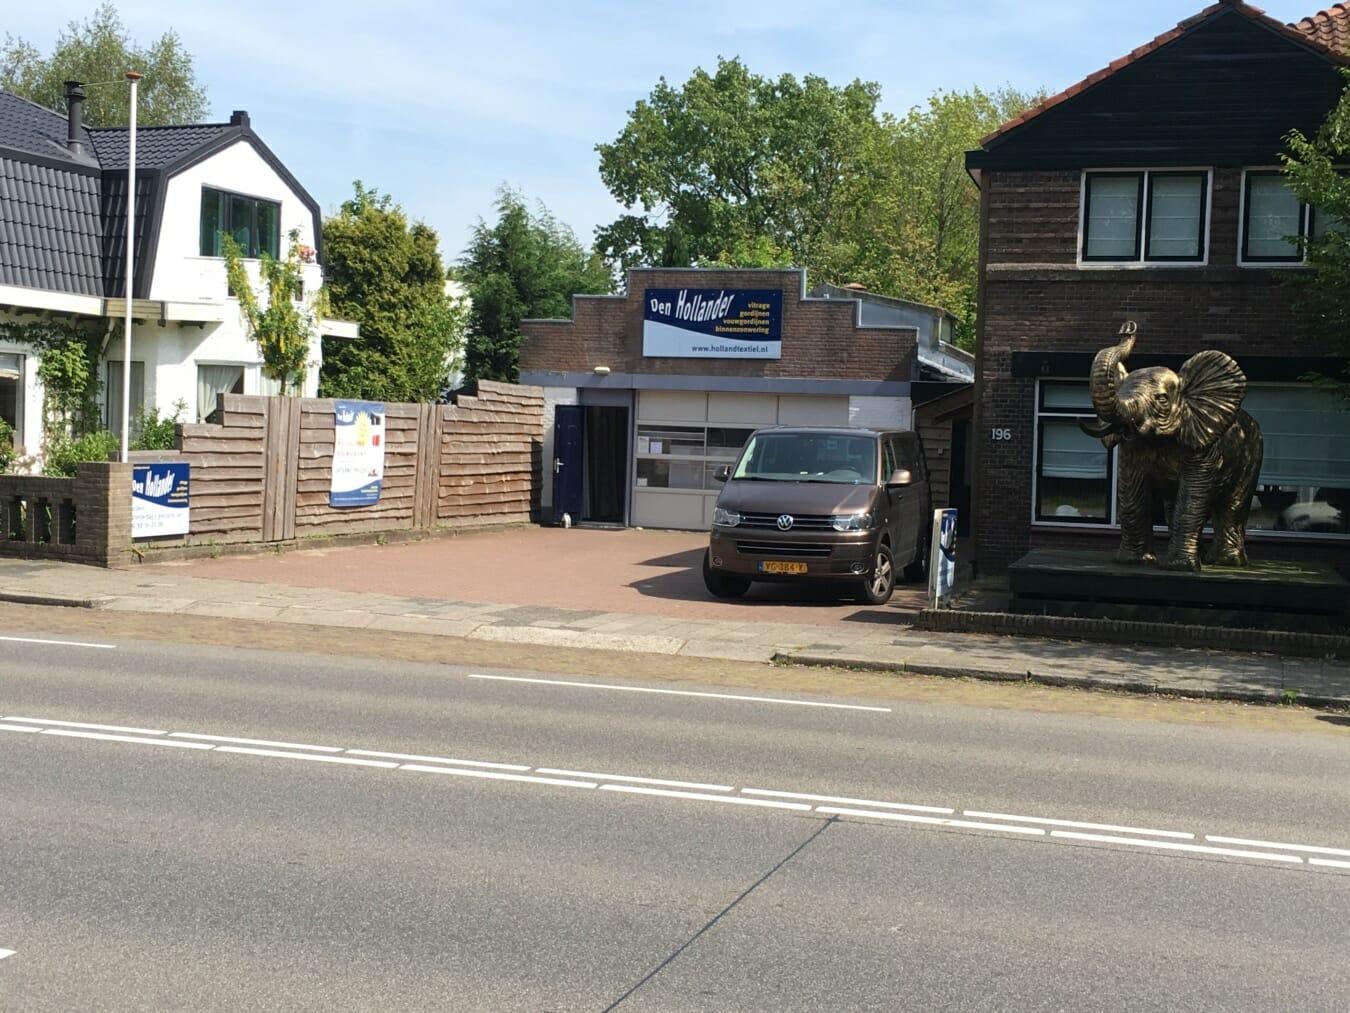 Den Hollander Gordijnen - winkelpand